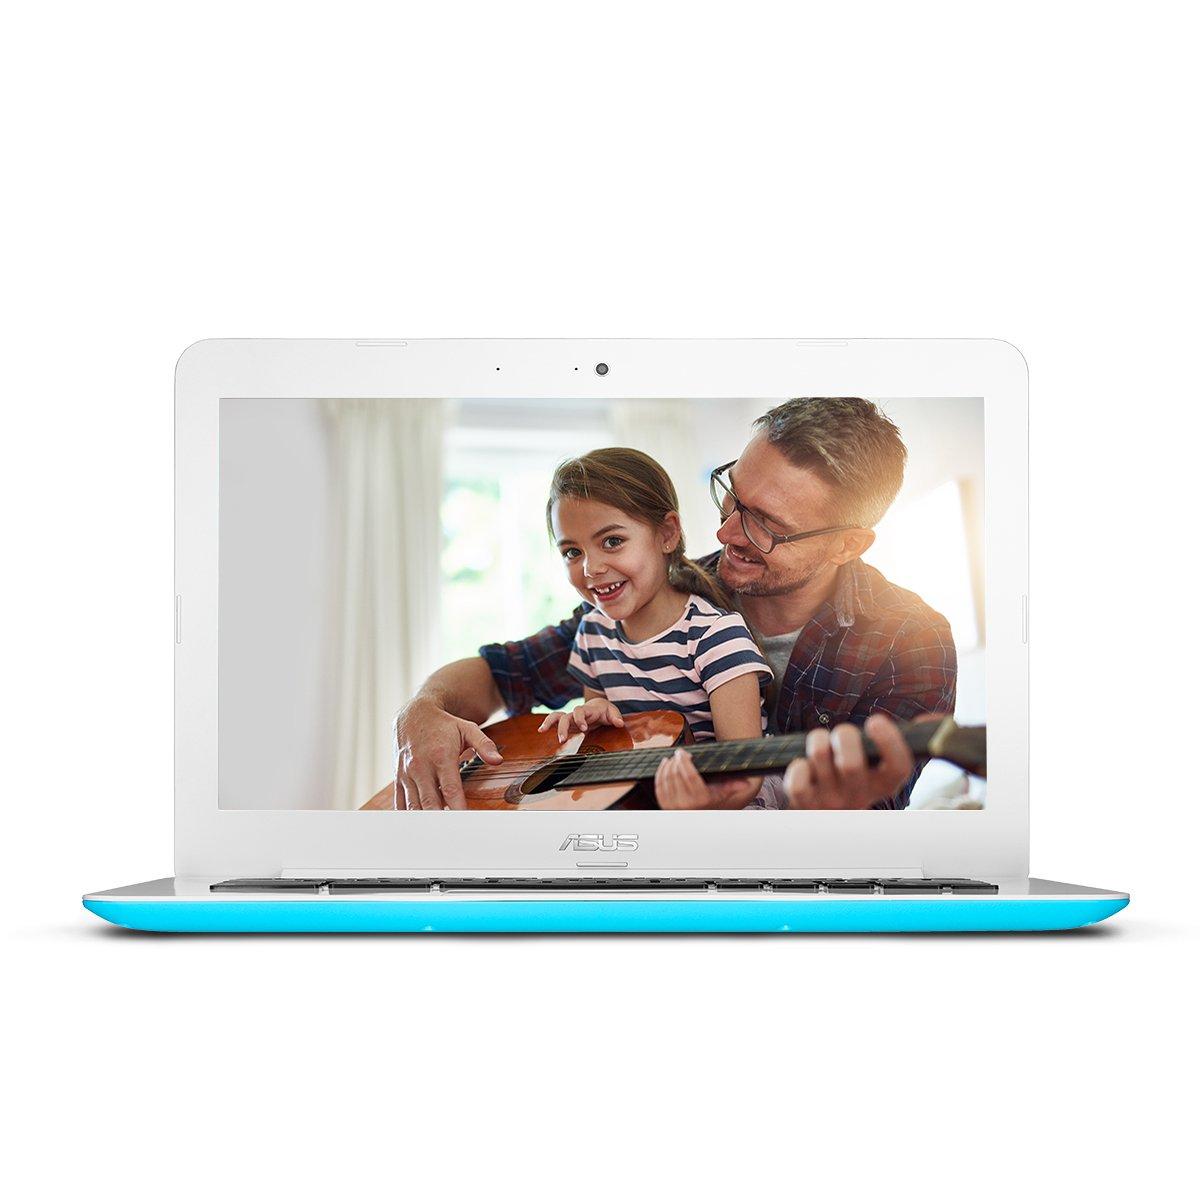 ASUS Chromebook C300SA 13.3 Inch (Intel Celeron, 4GB, 16GB eMMC, Light Blue)